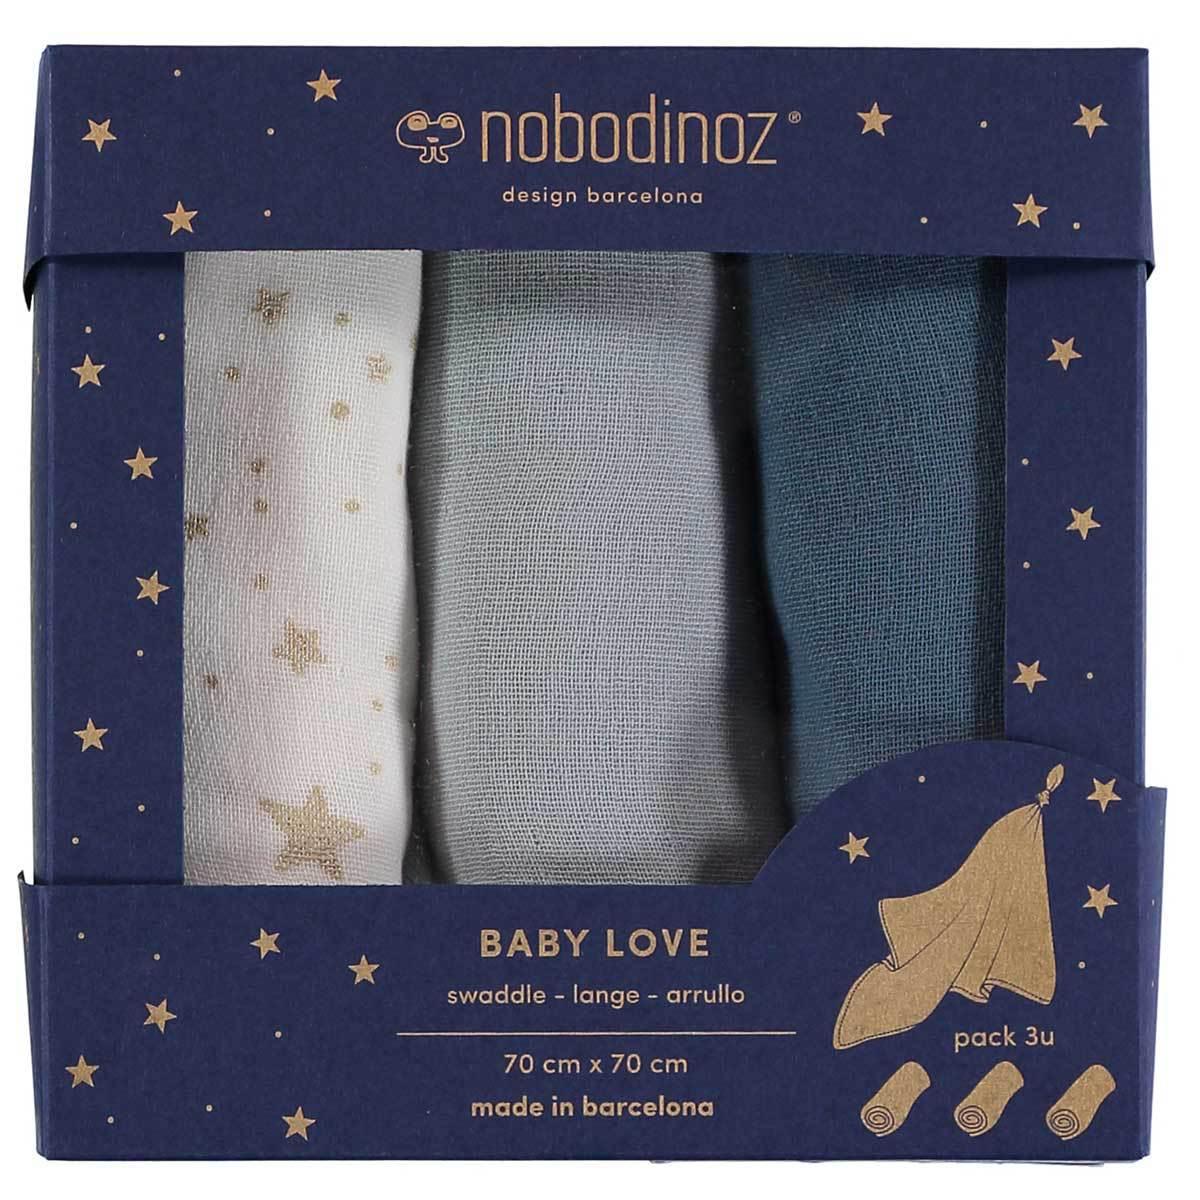 Lange Lot de 3 Langes Baby Love - Night Blue Lot de 3 Langes Baby Love - Night Blue